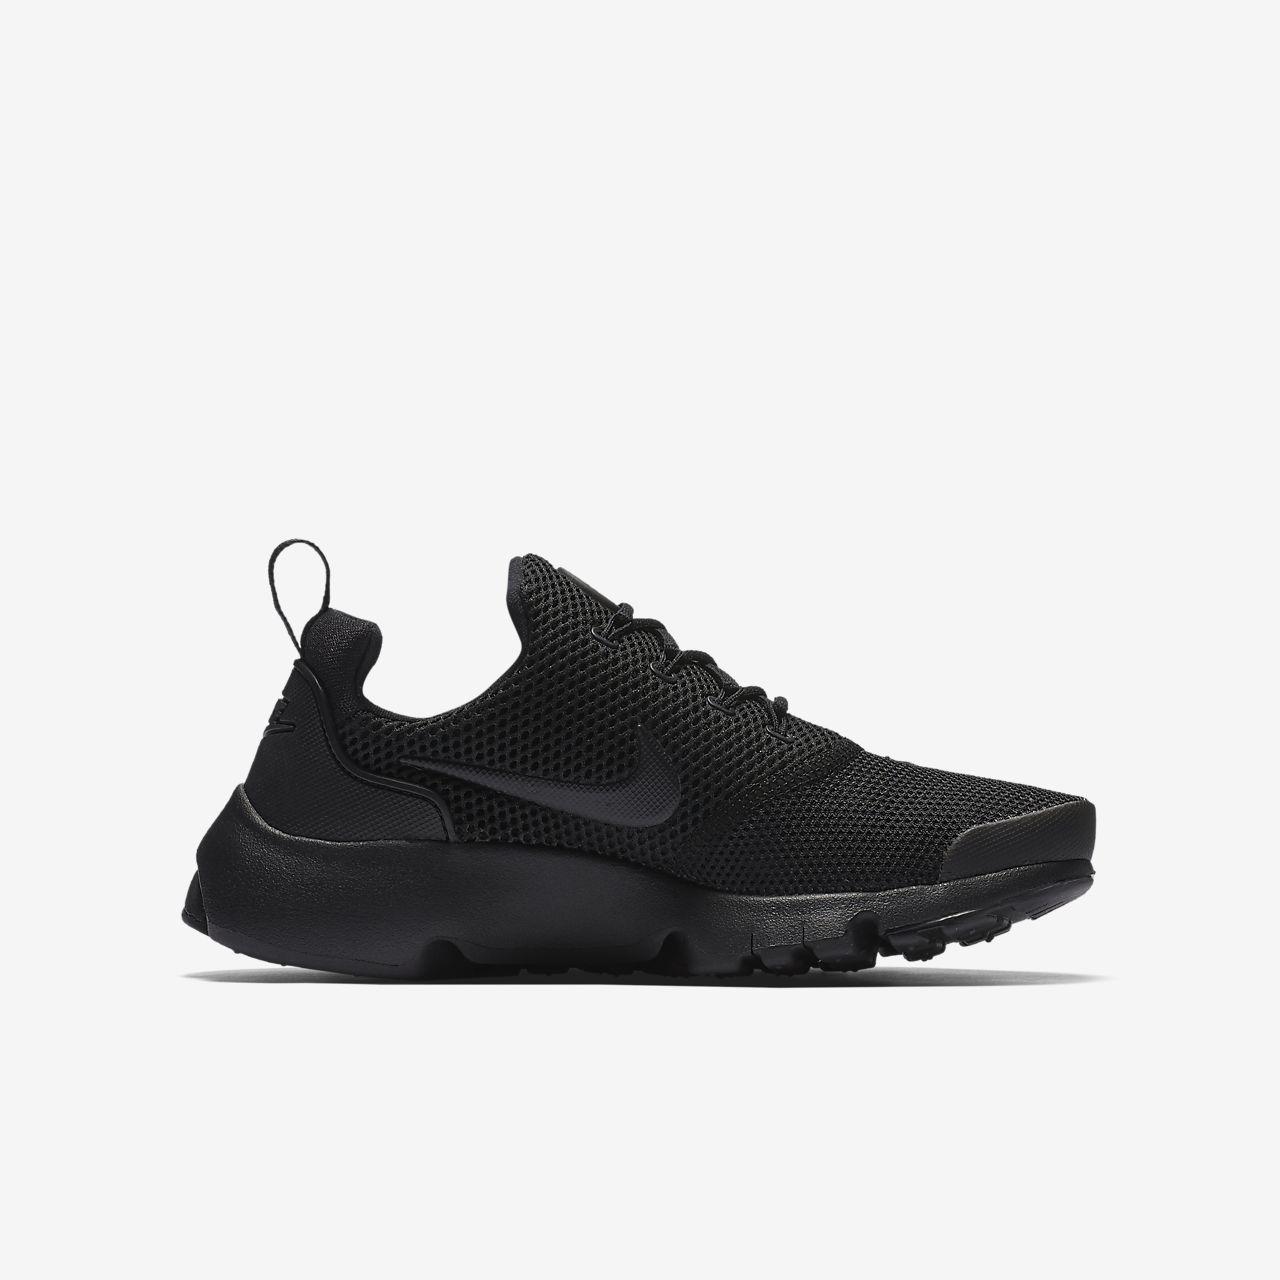 Chaussures Nike Air Jordan 40 noires Casual enfant o2gUGY7hr6